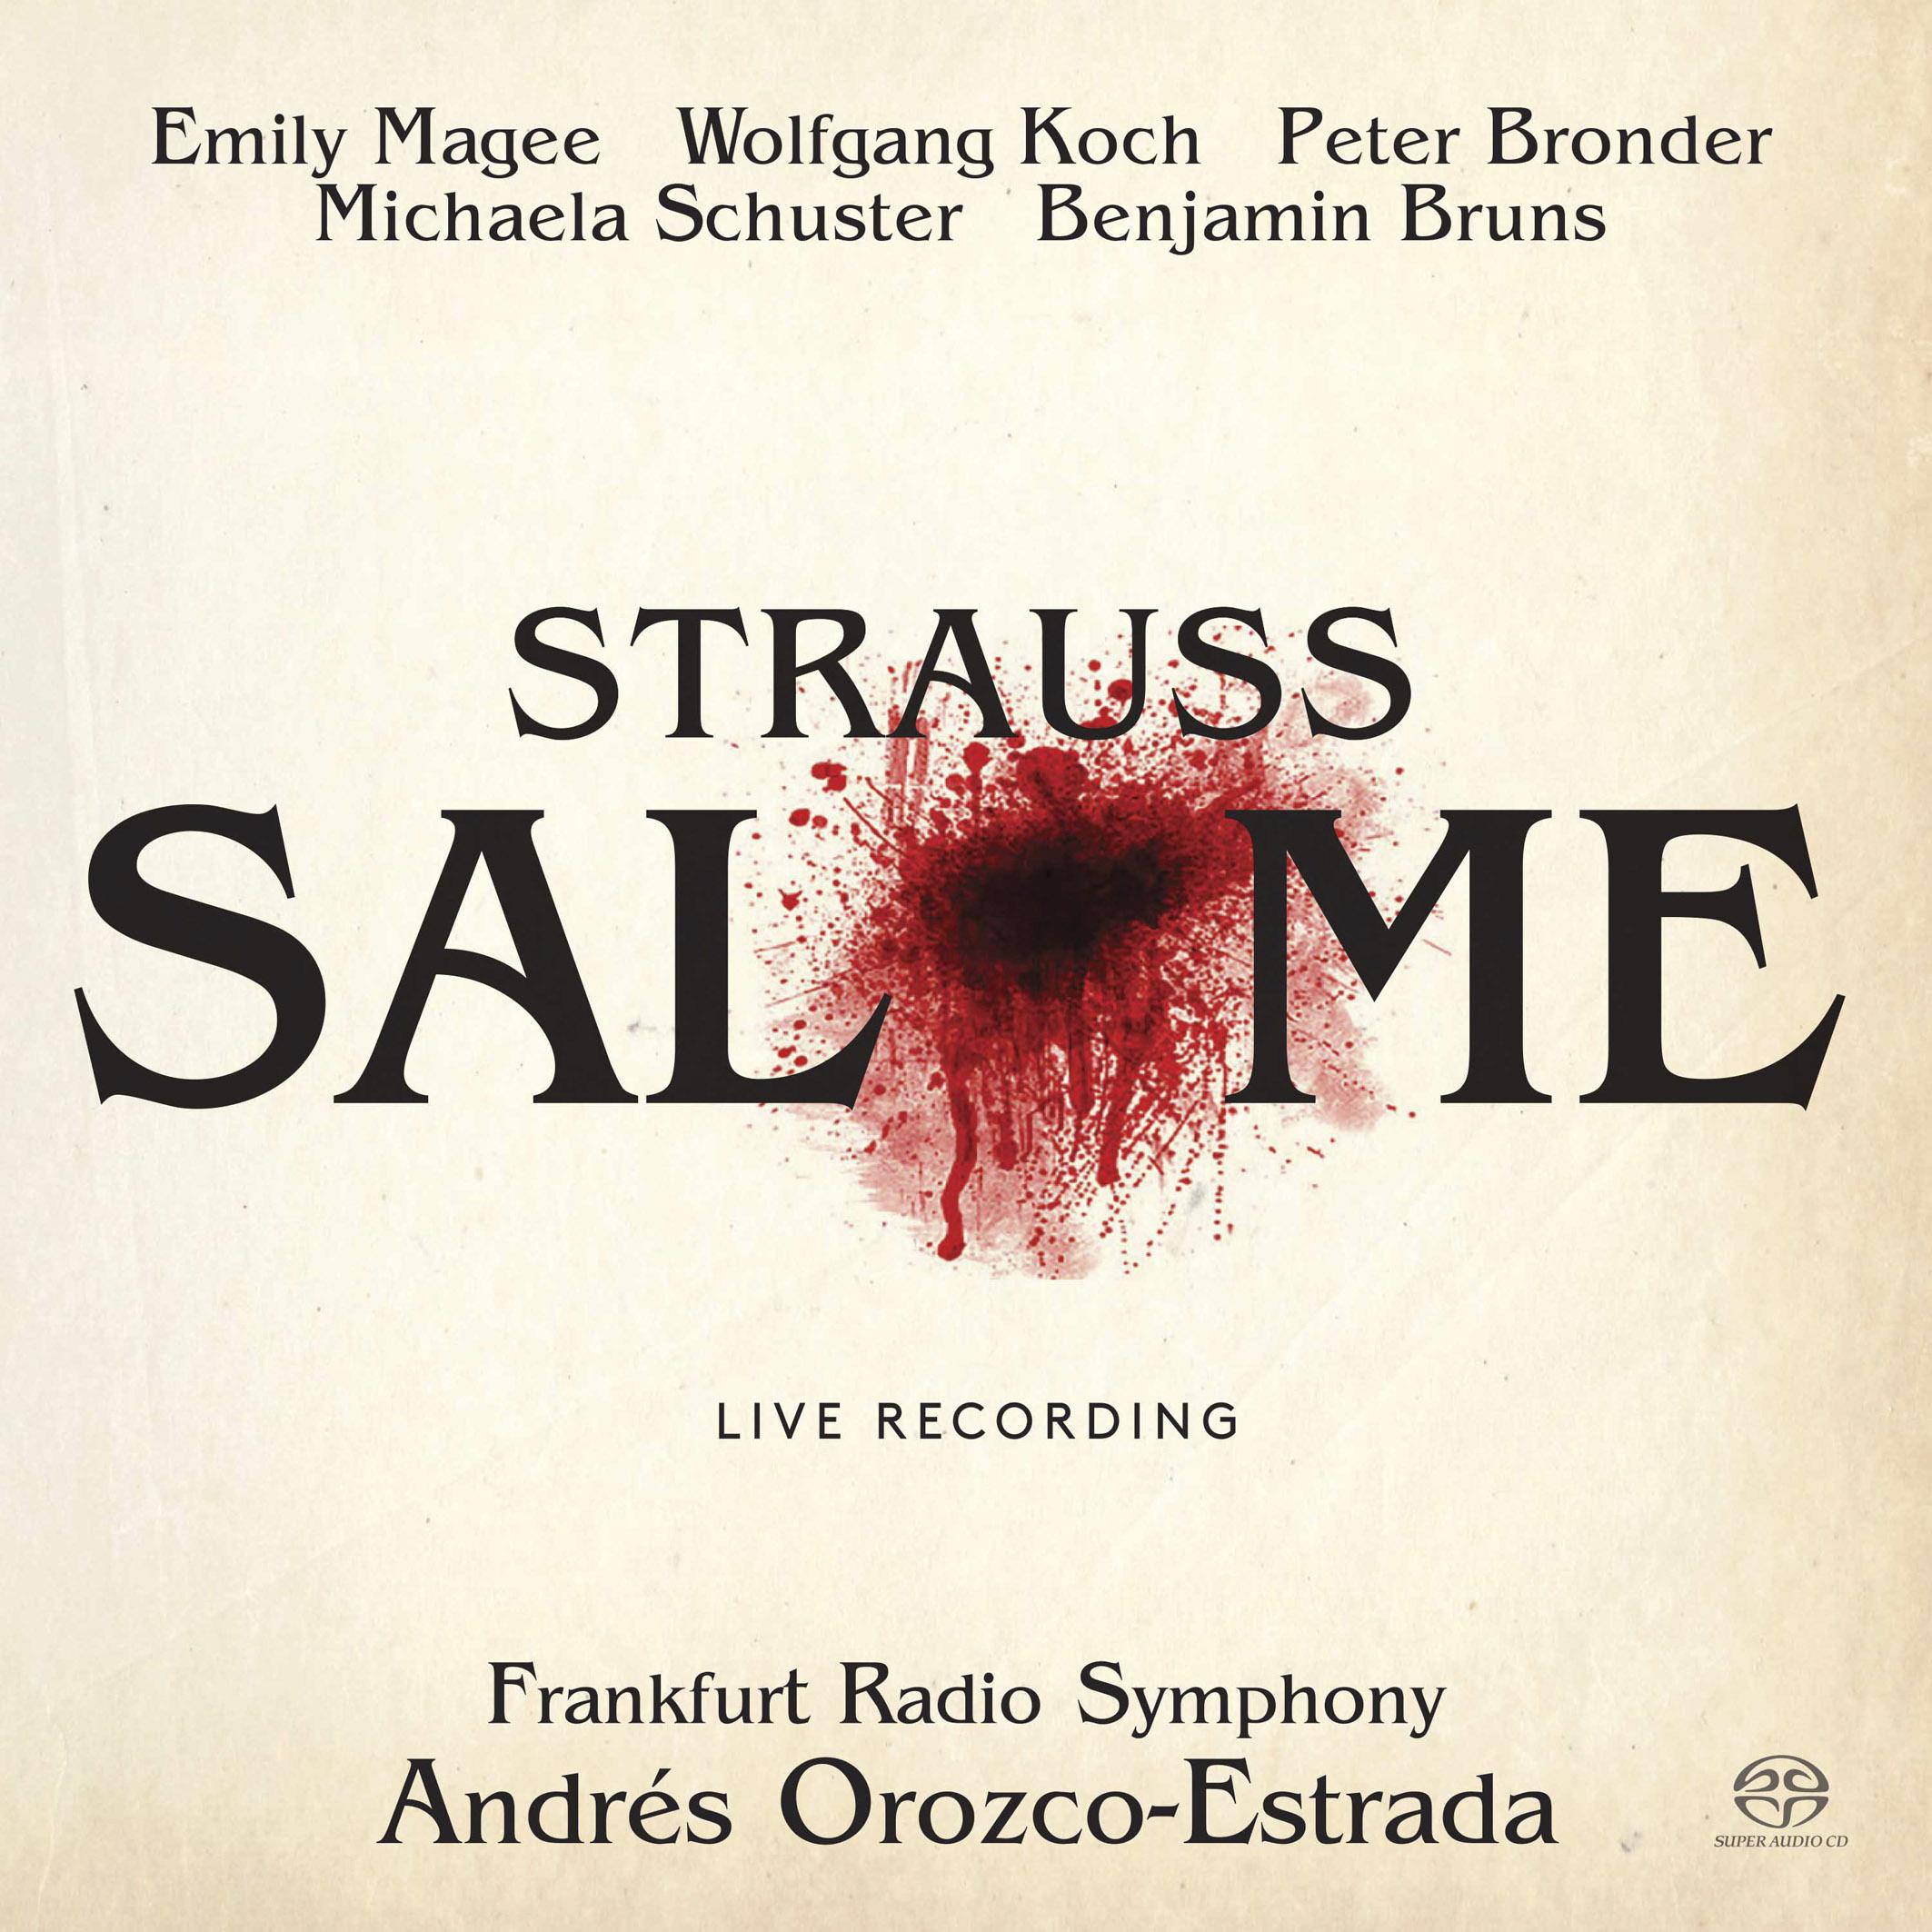 Salome, Emily Magee, Frankfurt Radio Symphony, Andrés Orozco-Estrada